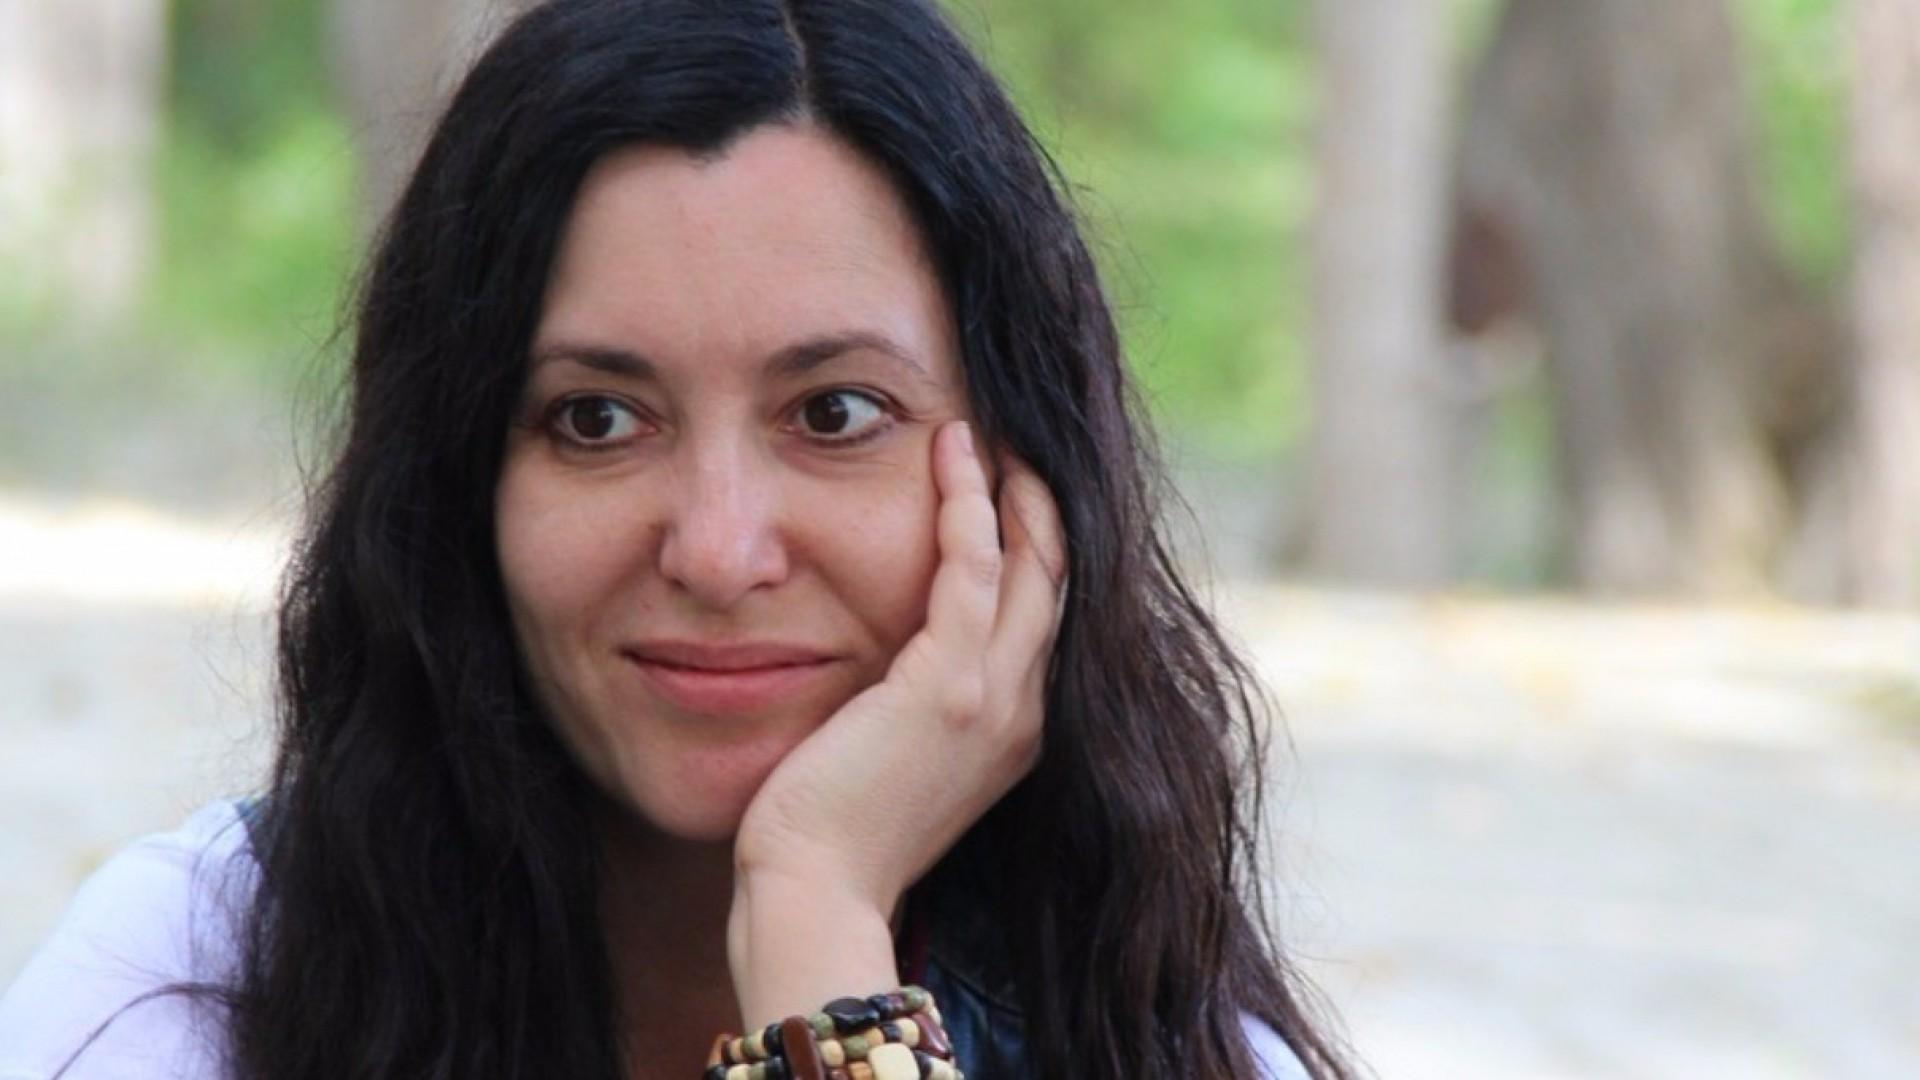 Анна Гречко: «А сегодня солнце мне говорит: «давай-ка стишок нацарапай!»